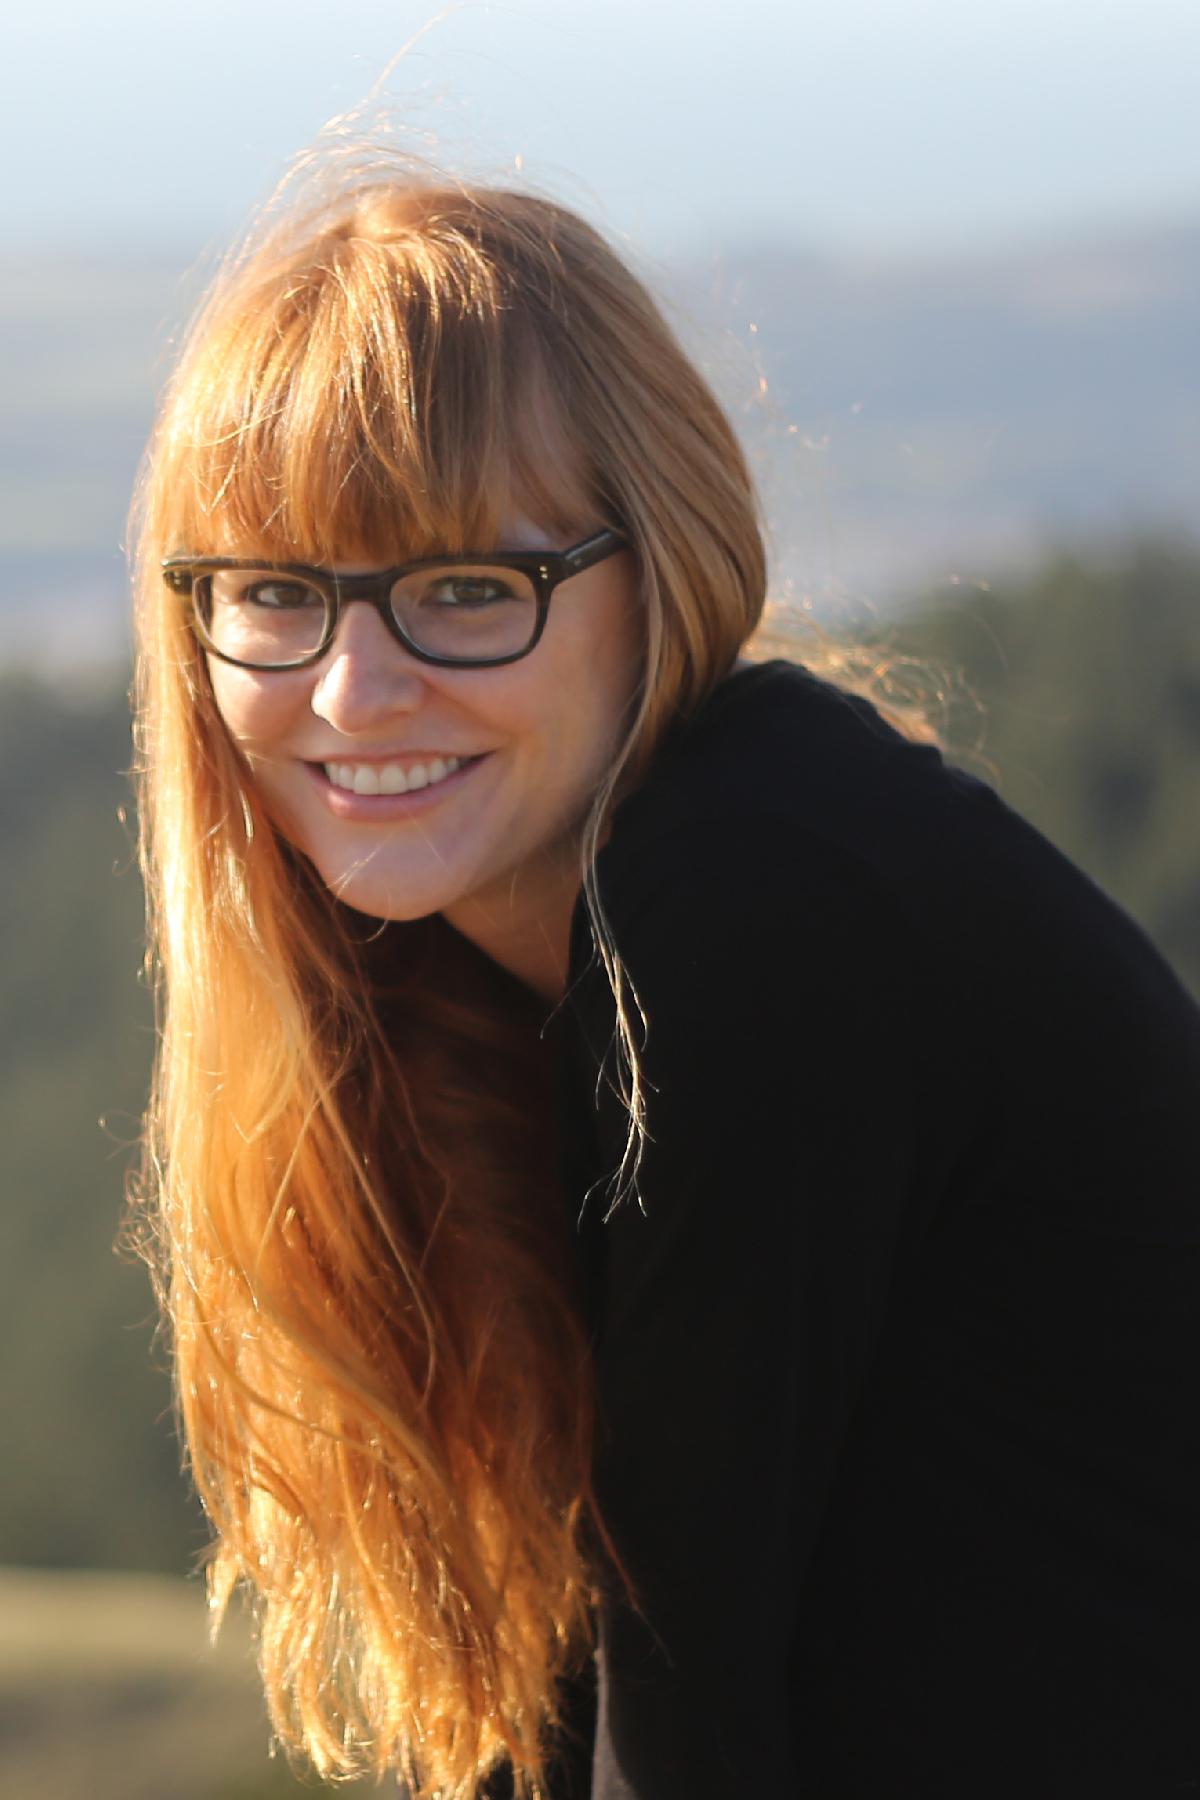 Emma Berquist